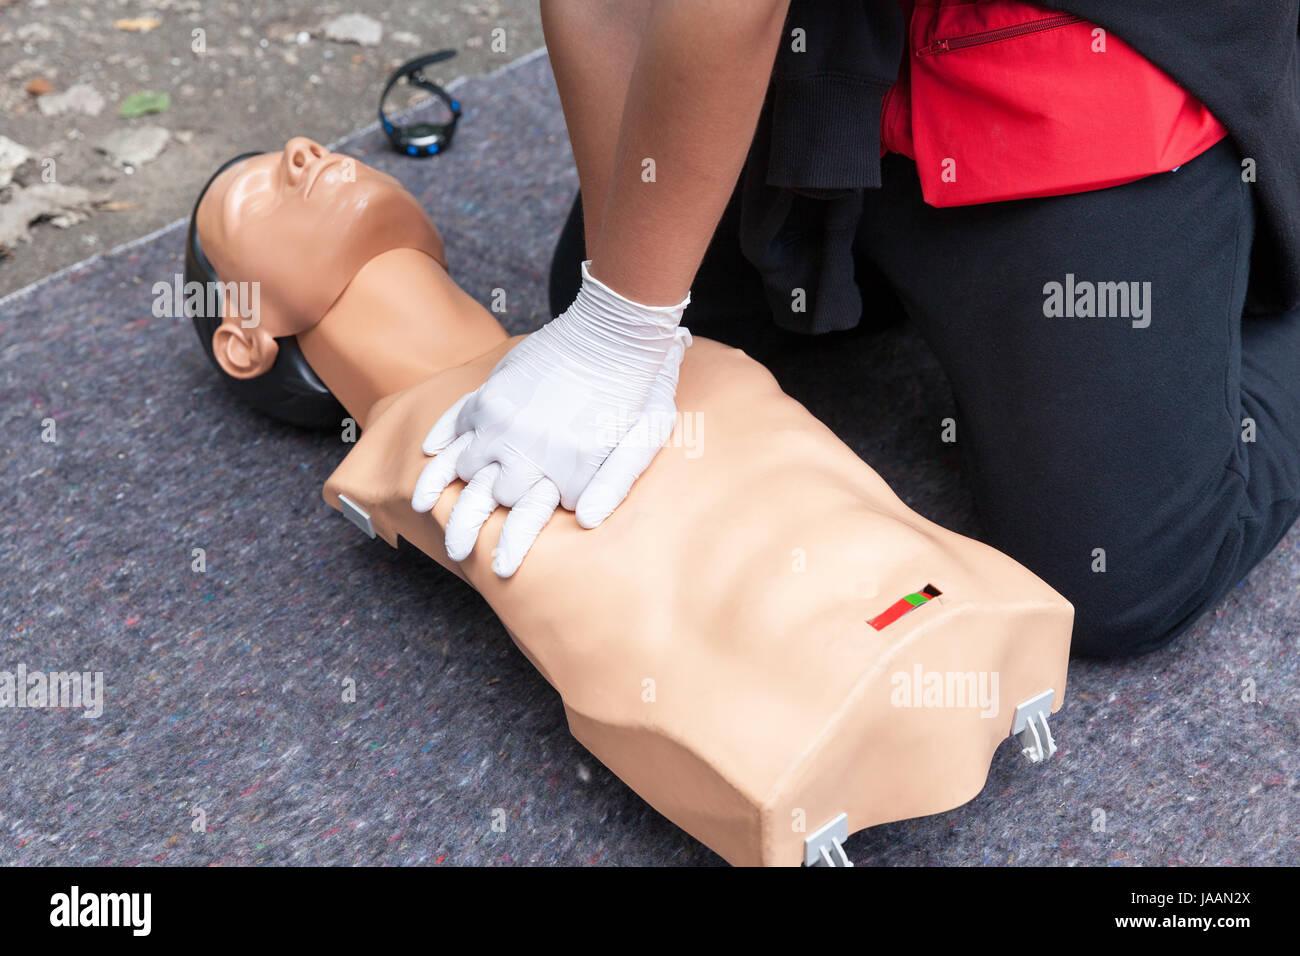 b6c3eaf081 Cardiopulmonary resuscitation - CPR. First aid training detail. Heart  massage.